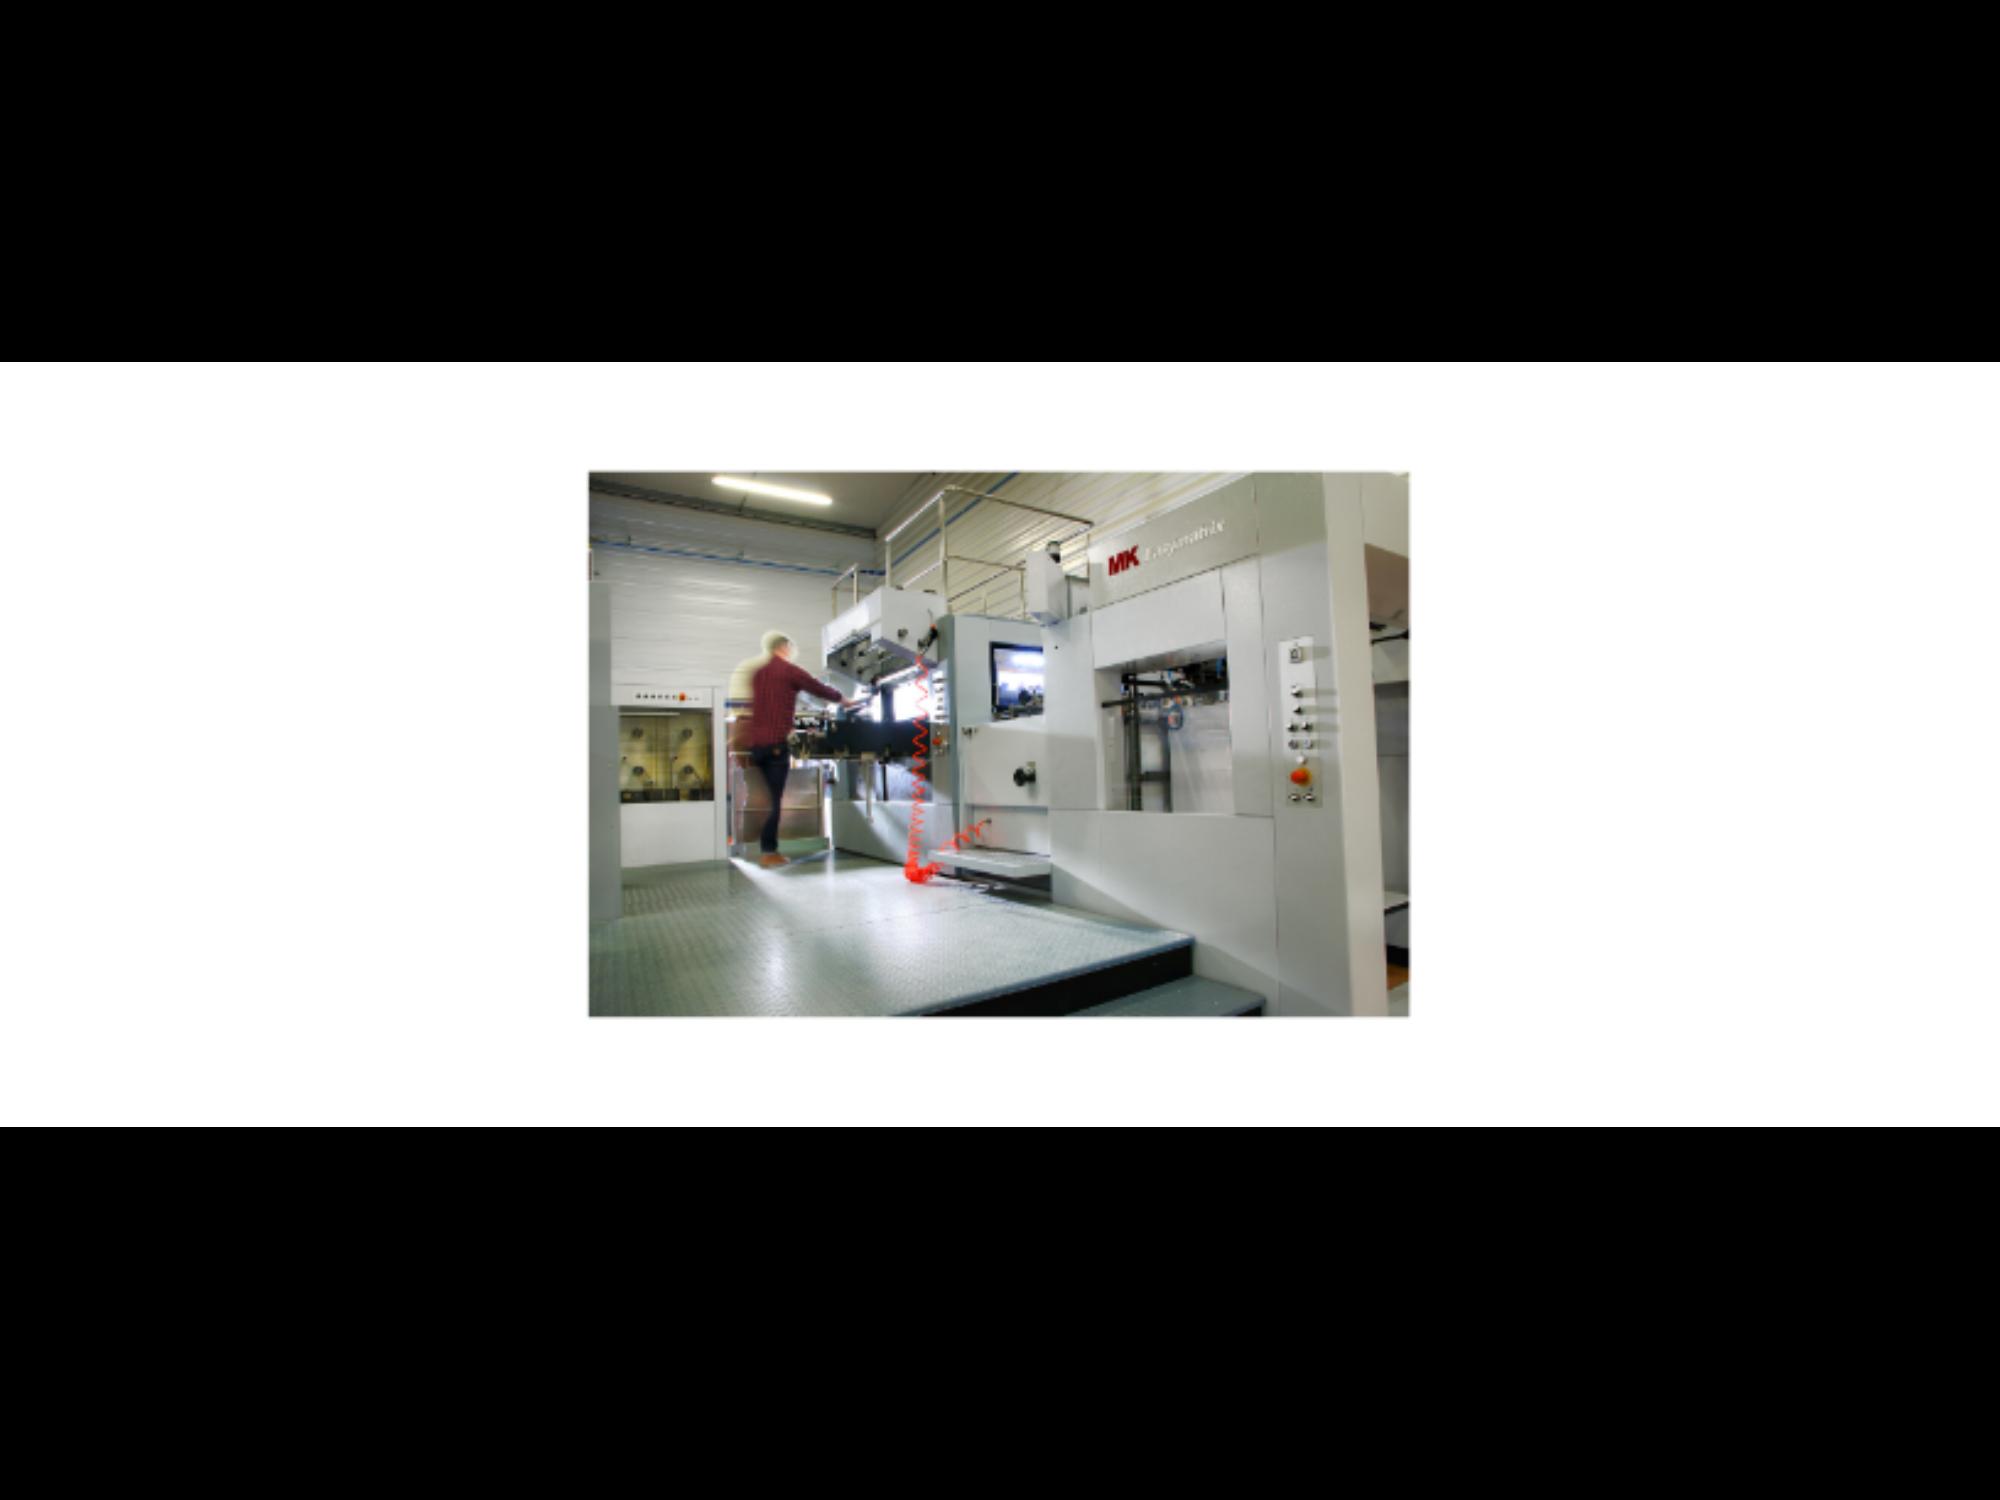 Notre MK EASYMATRIX Découpe / Gaufrage